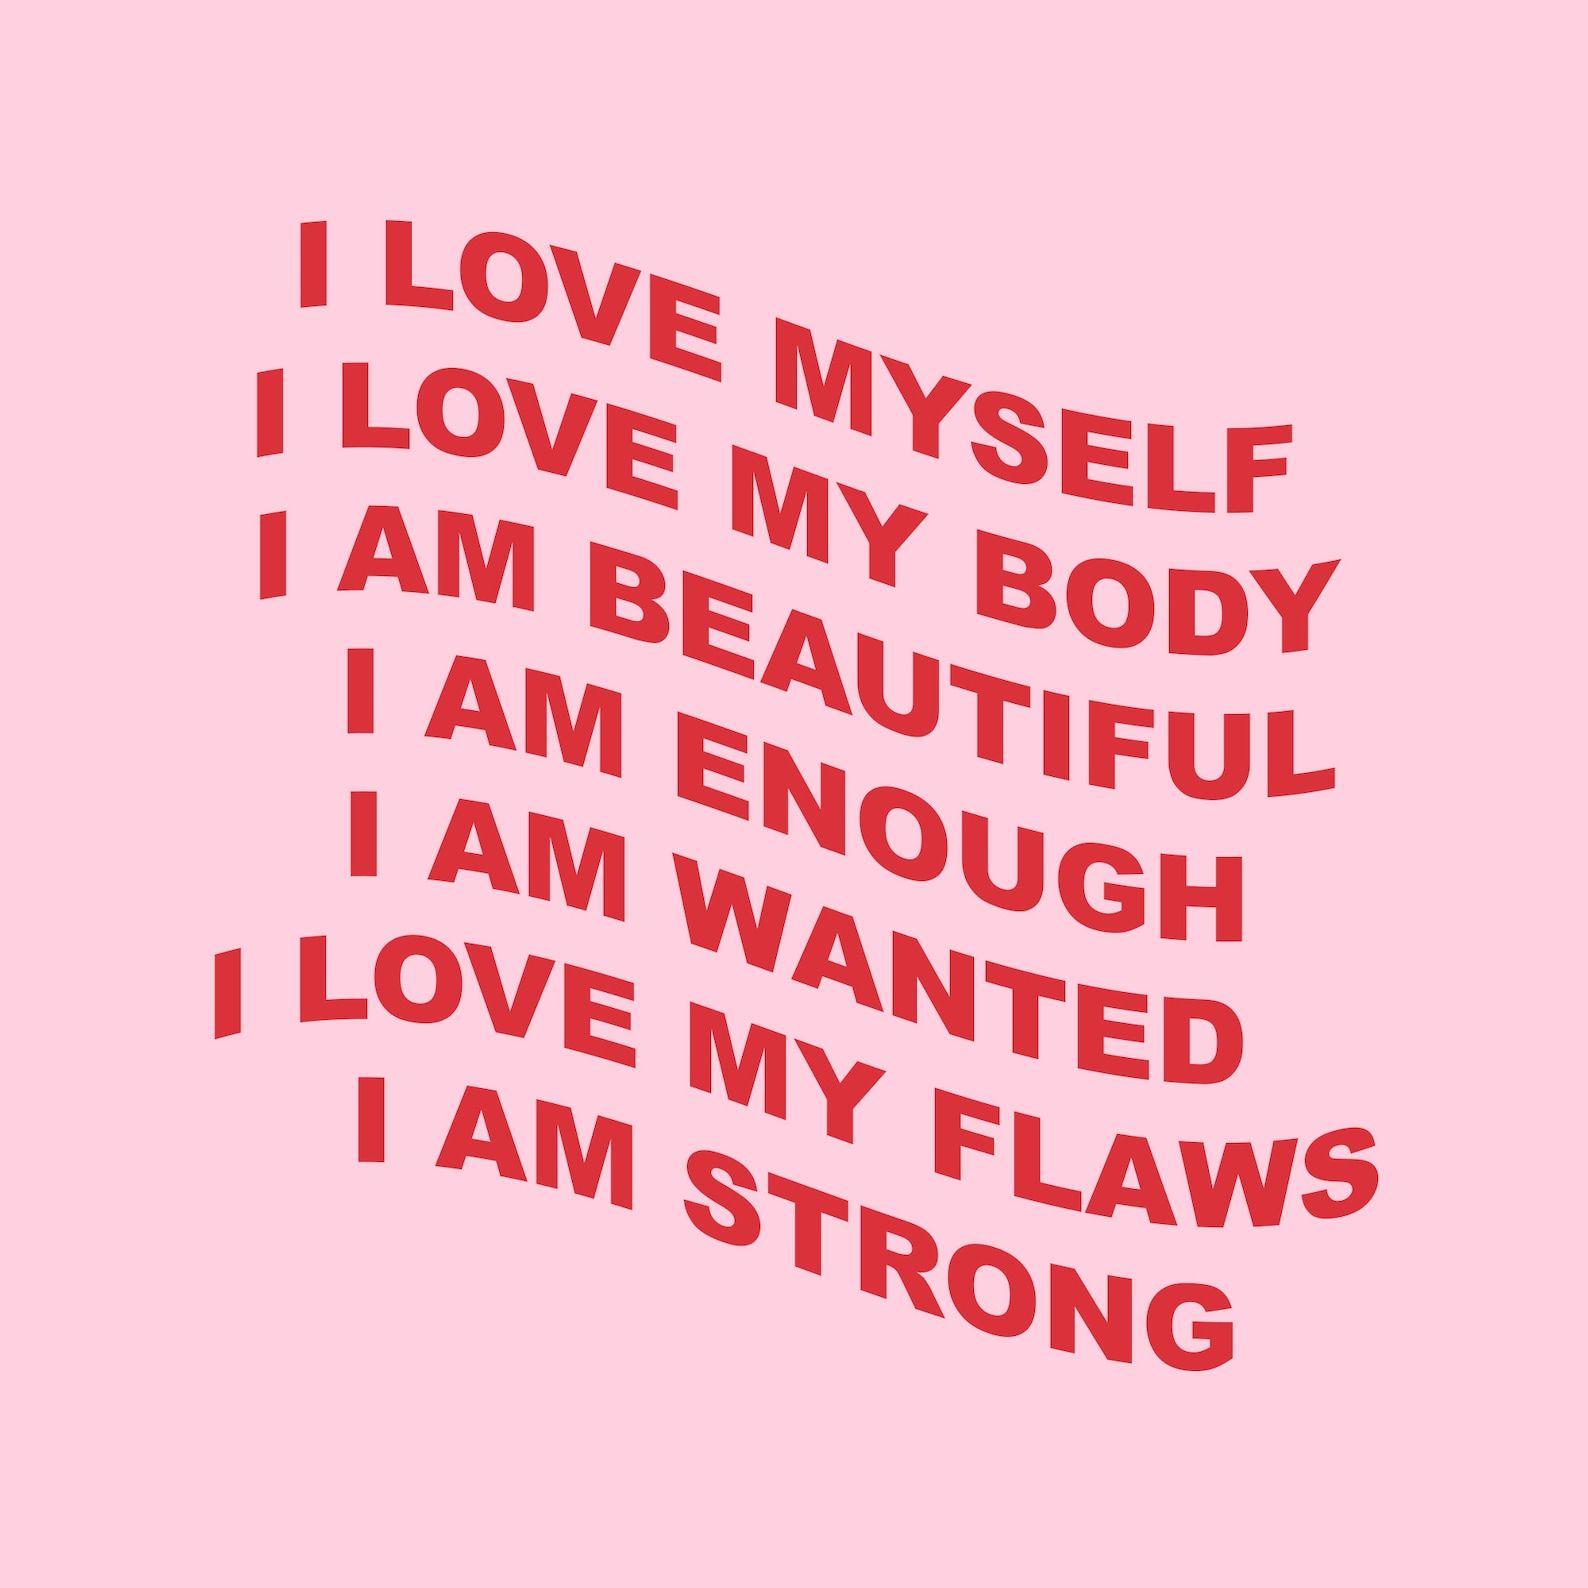 Self love affirmations aesthetic art print (2 colour options) self love, body positive, positivity, aesthetic room decor, self love print